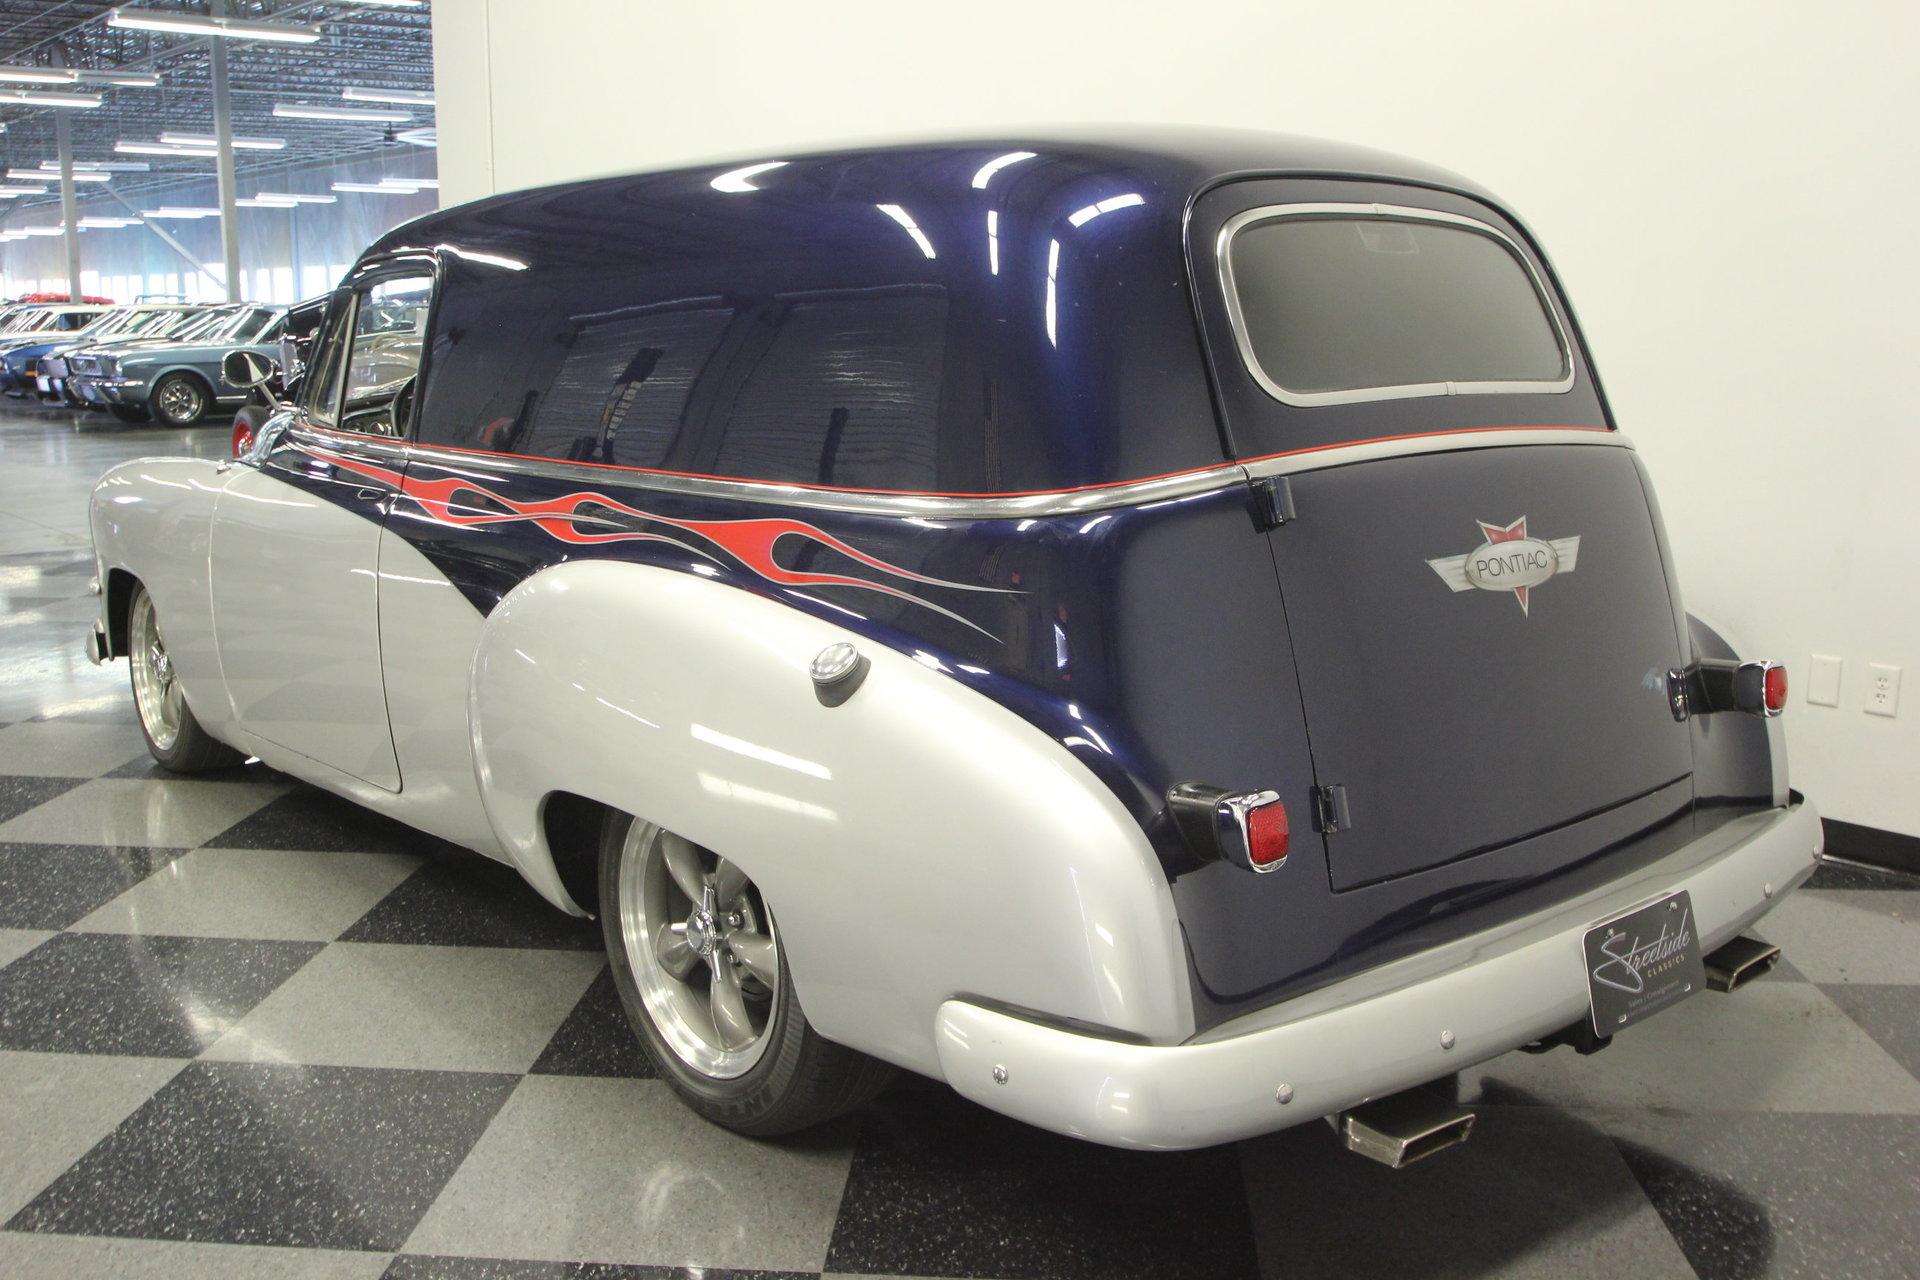 Painting 1950 Pontiac Star Chief Streamliner Streetside Classics The Nations 1920x1280